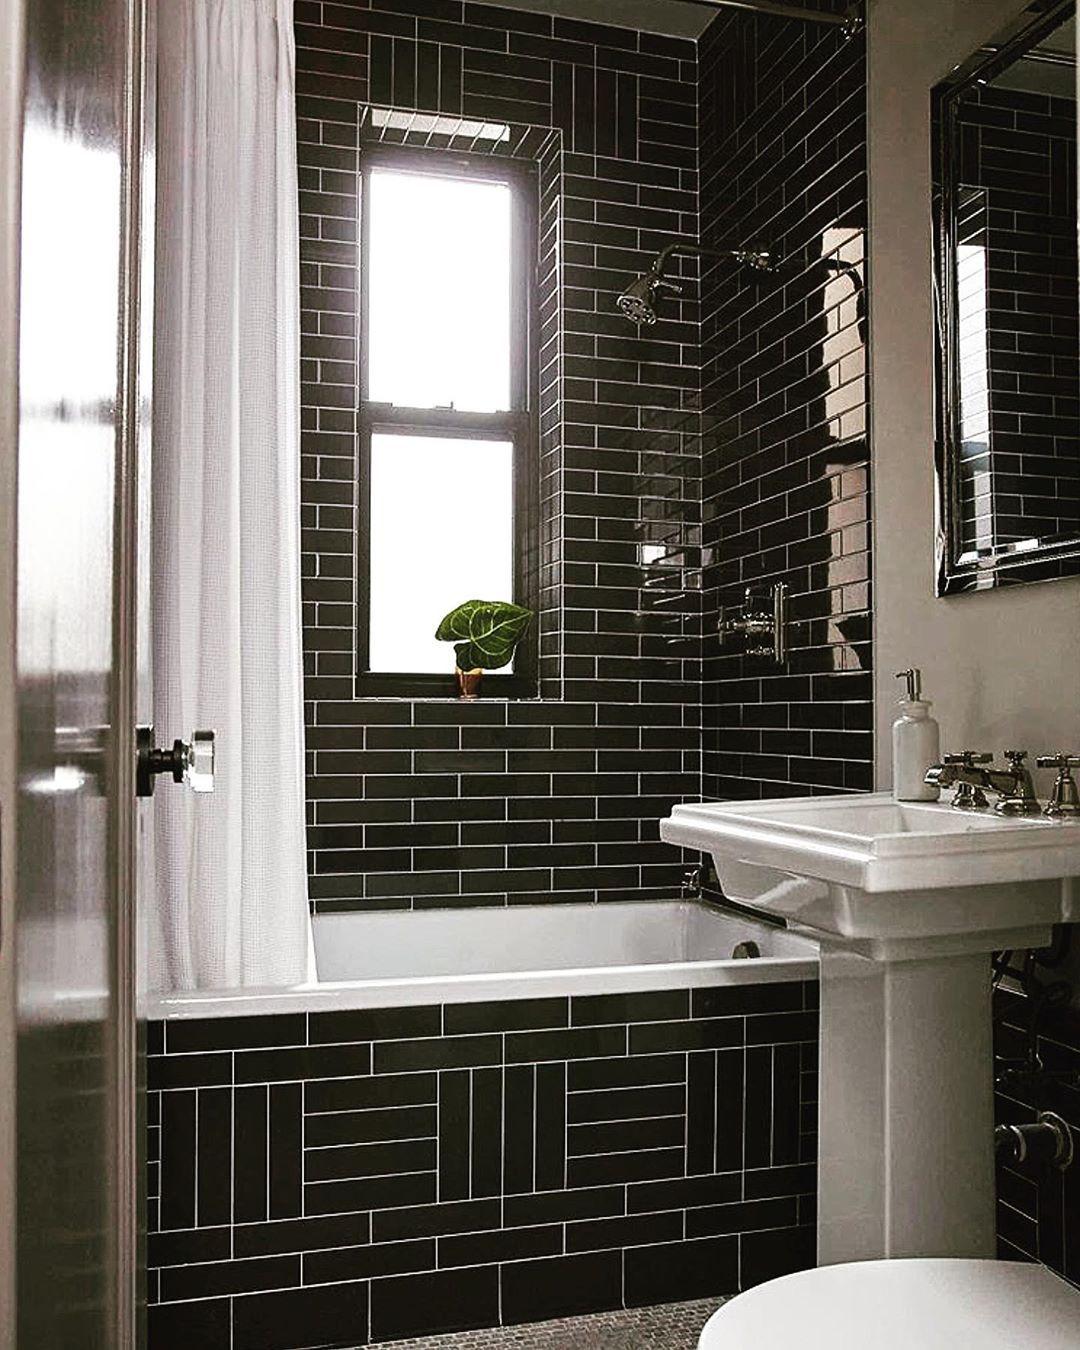 Beautiful Use Of Tile Danmazzarini Art Architecture Apartment Nyc Blackandwhite Bathroom Inspiration Decor Bathroom Decor Simple Bathroom Decor [ 1350 x 1080 Pixel ]